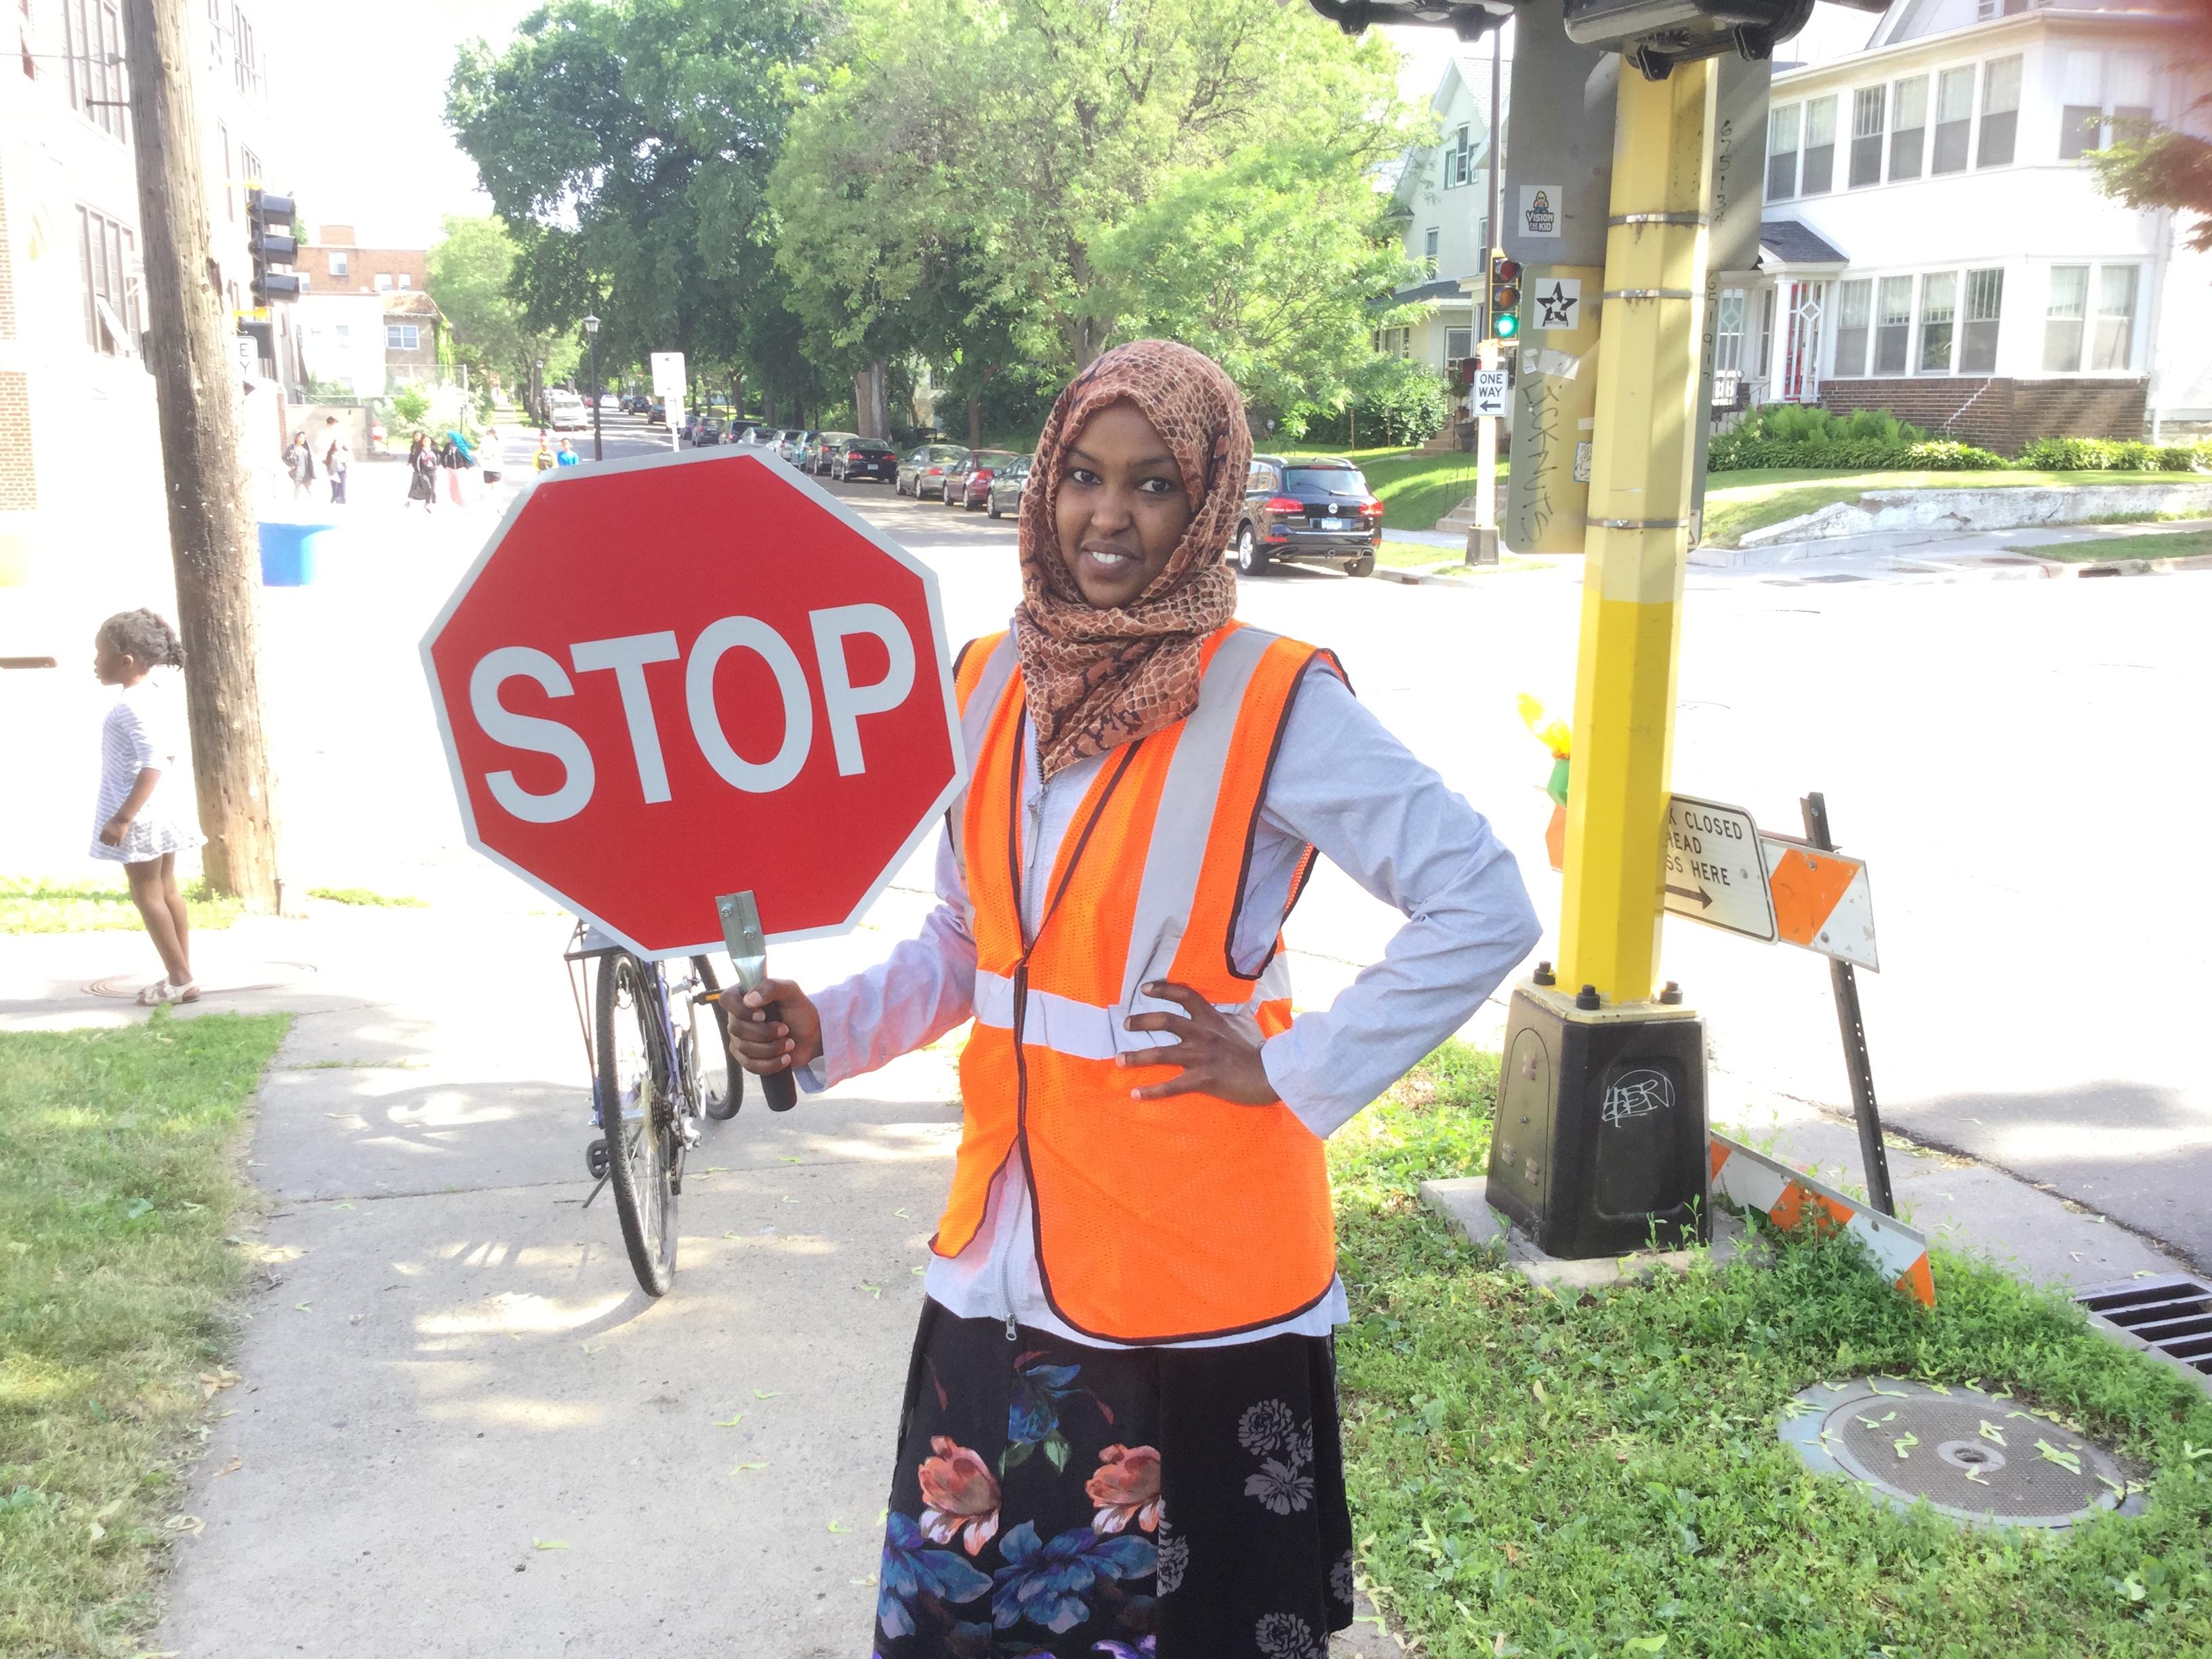 Dearborn Hiring Crossing Guards